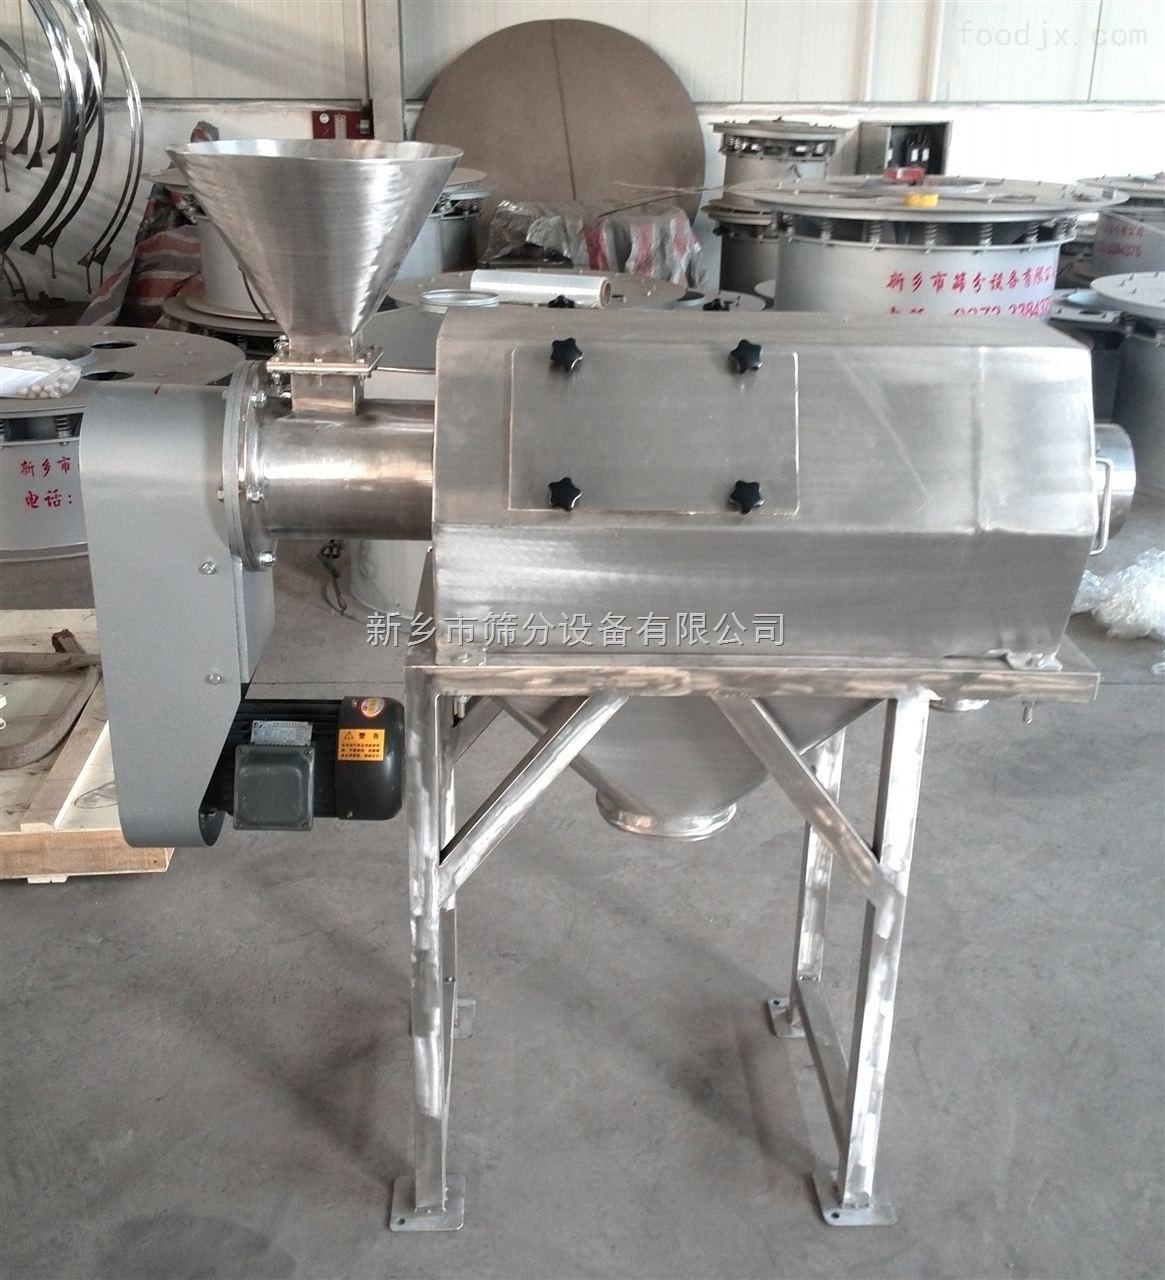 QXS-300厂家供应硫磺粉筛分机 气旋筛 耐腐蚀 产量高 新乡气旋筛厂家